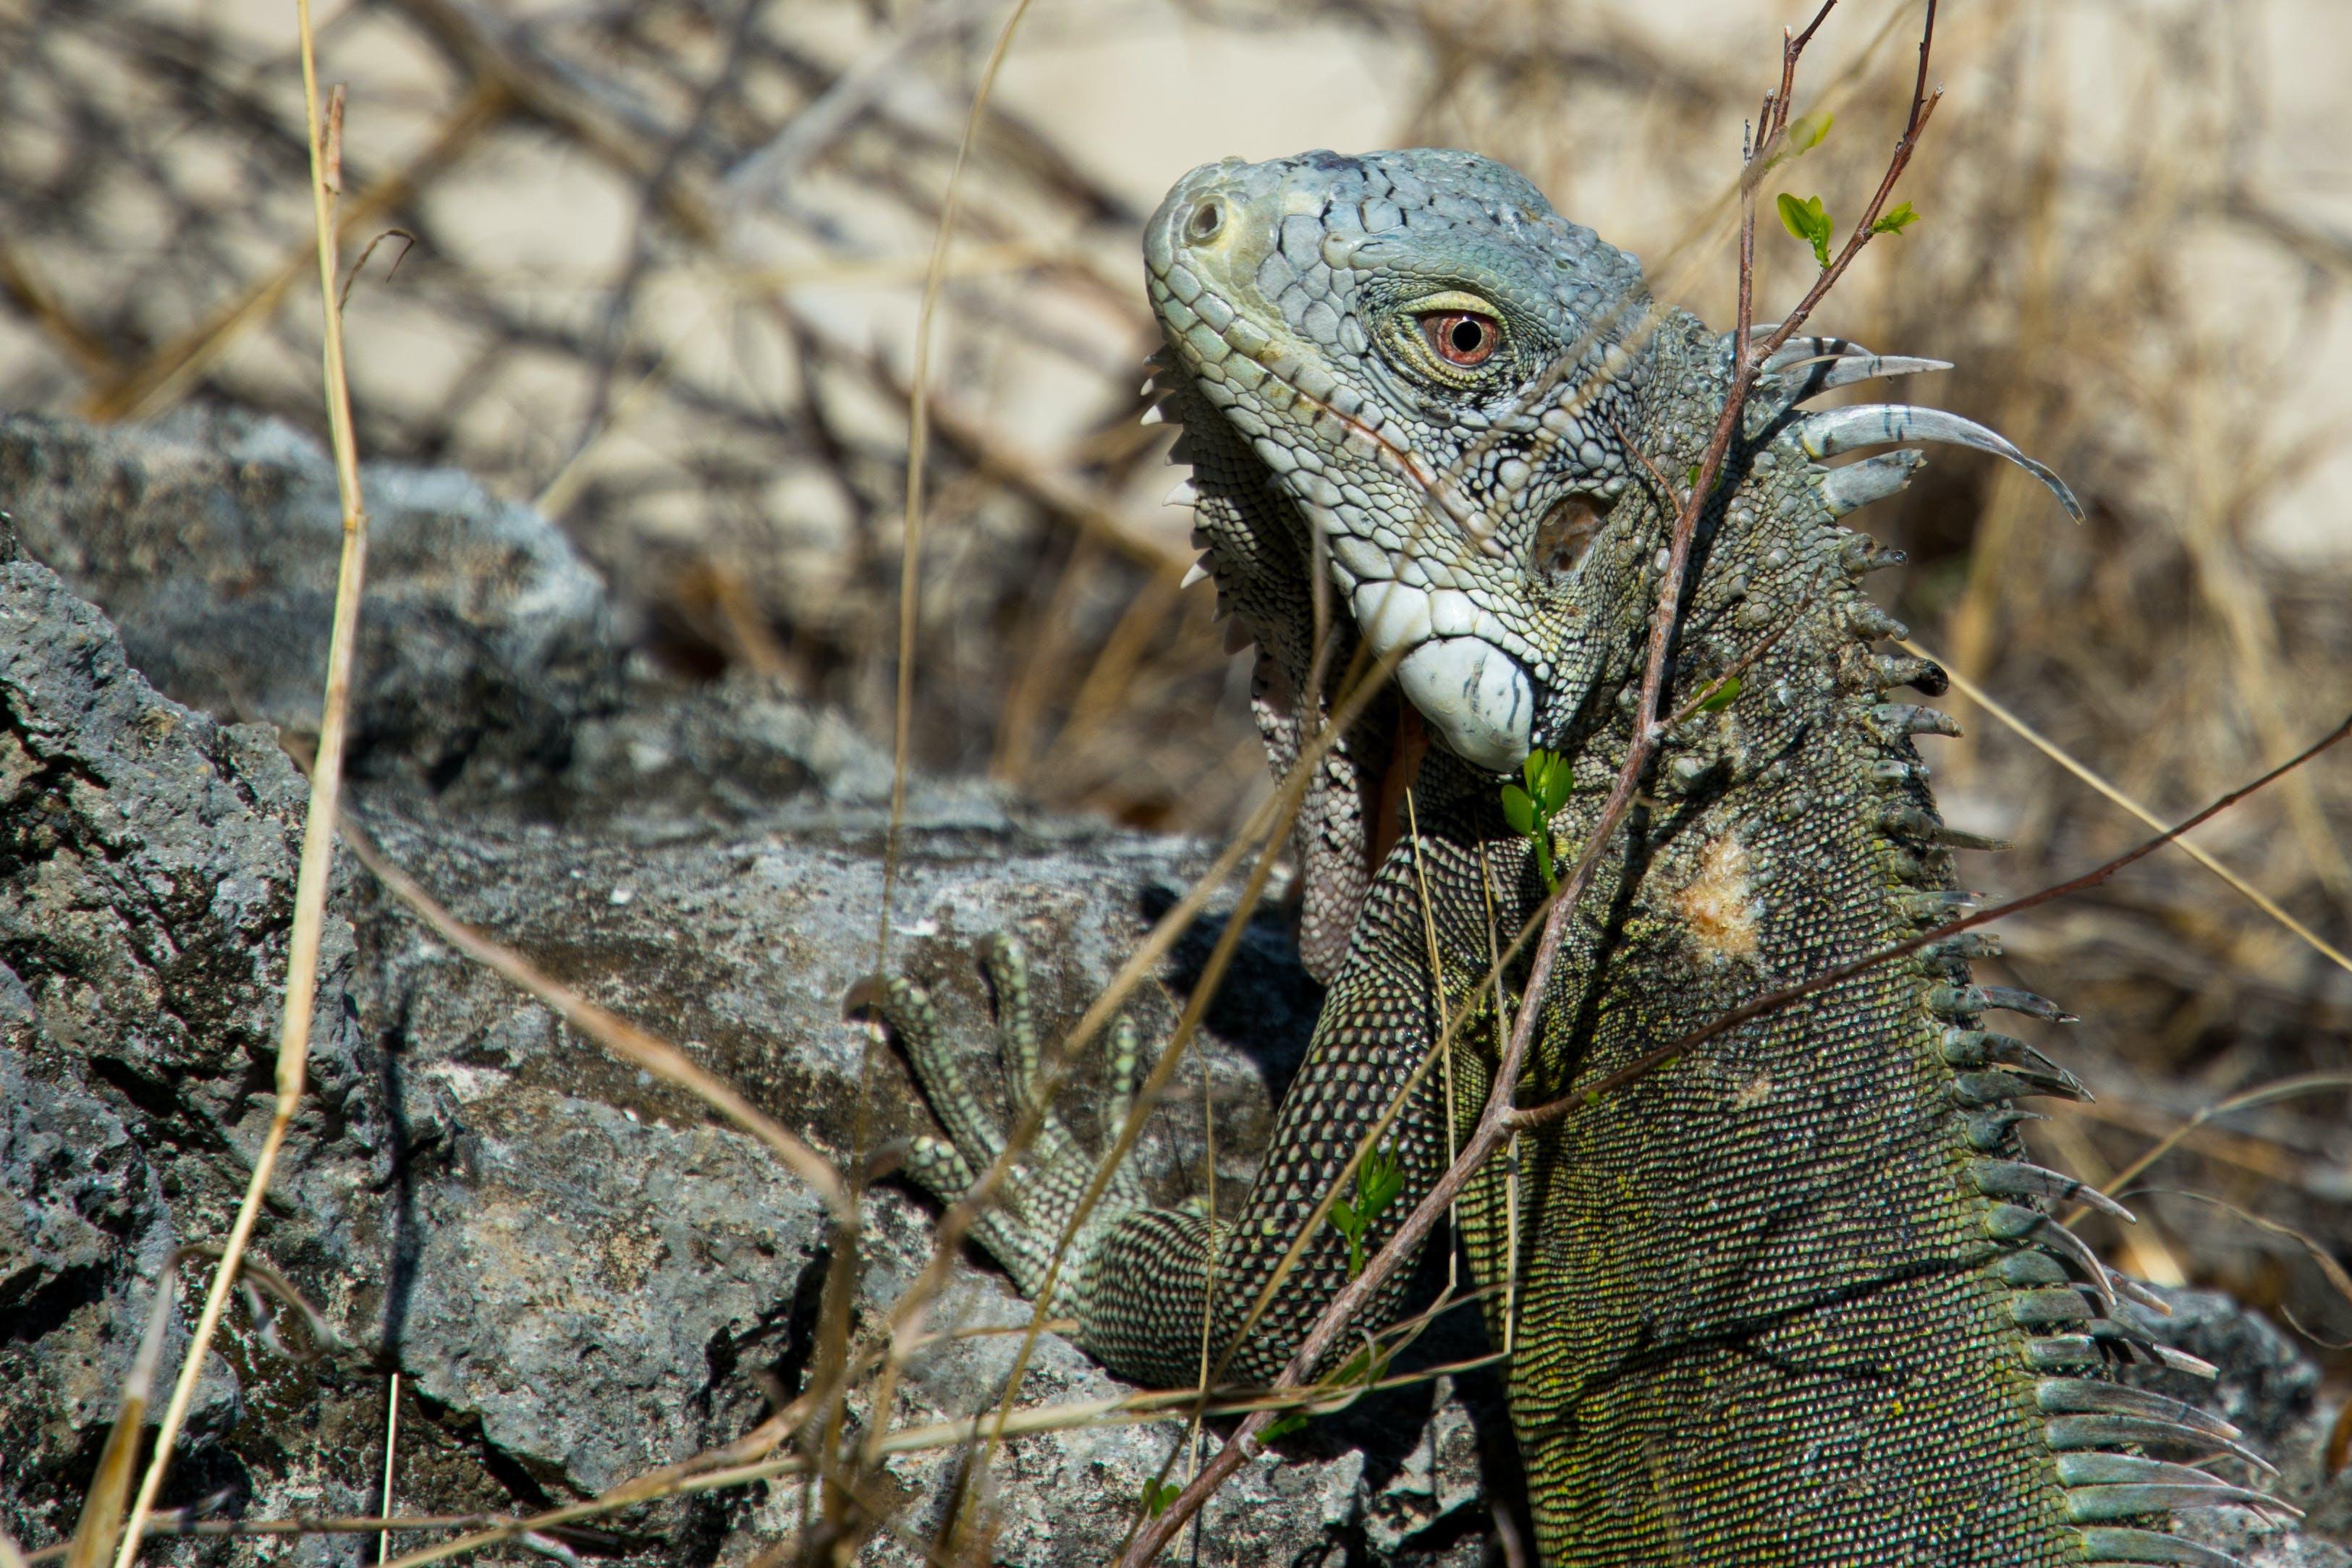 Kostenloses Stock Foto zu eidechse, leguan, reptil, reptilien